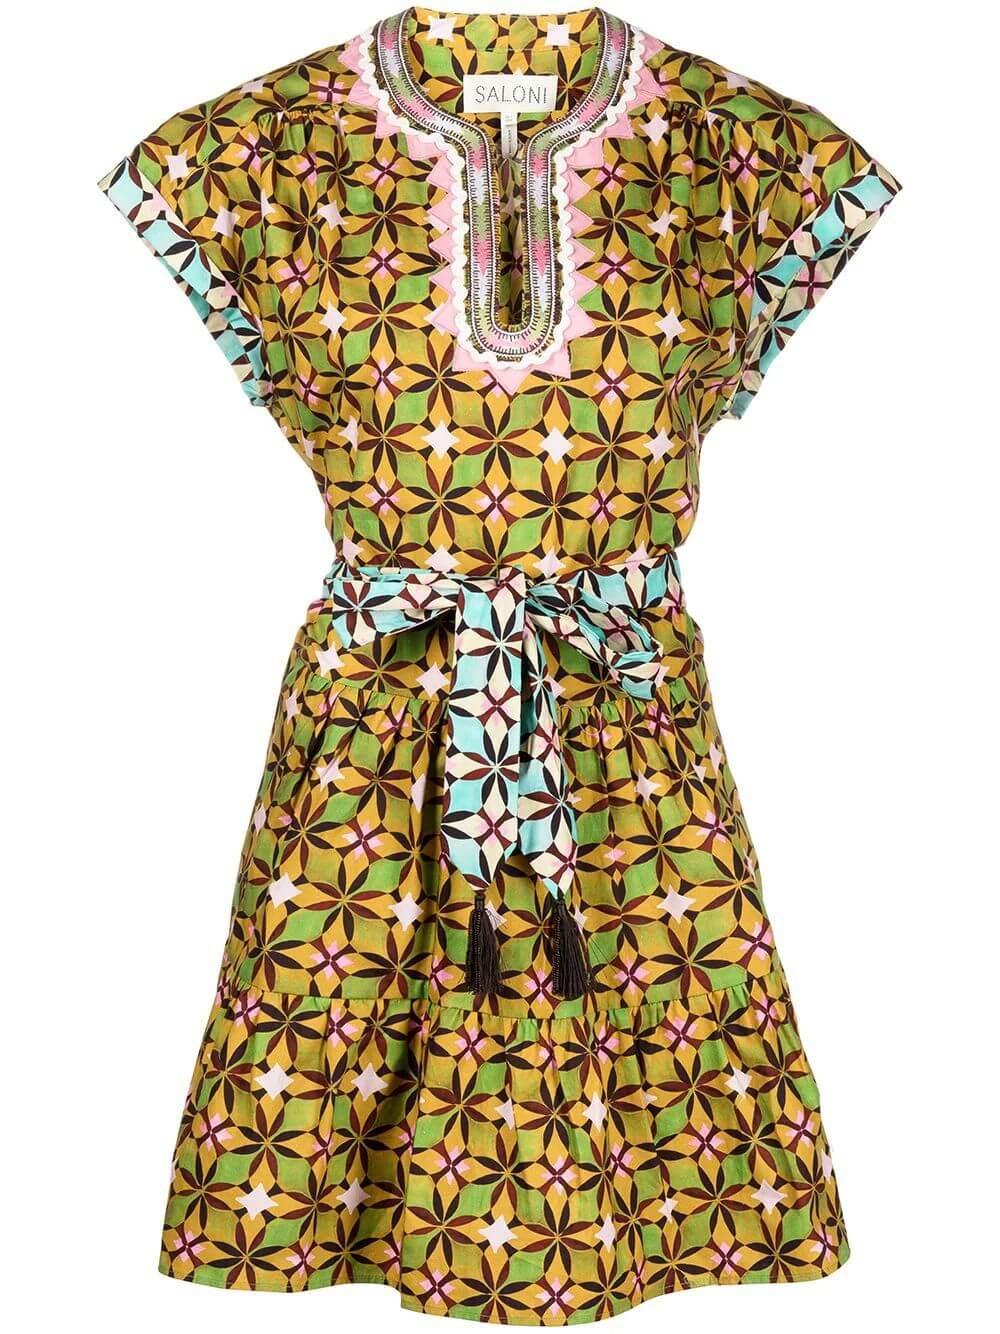 Ashley B Dress Item # 1206-AT